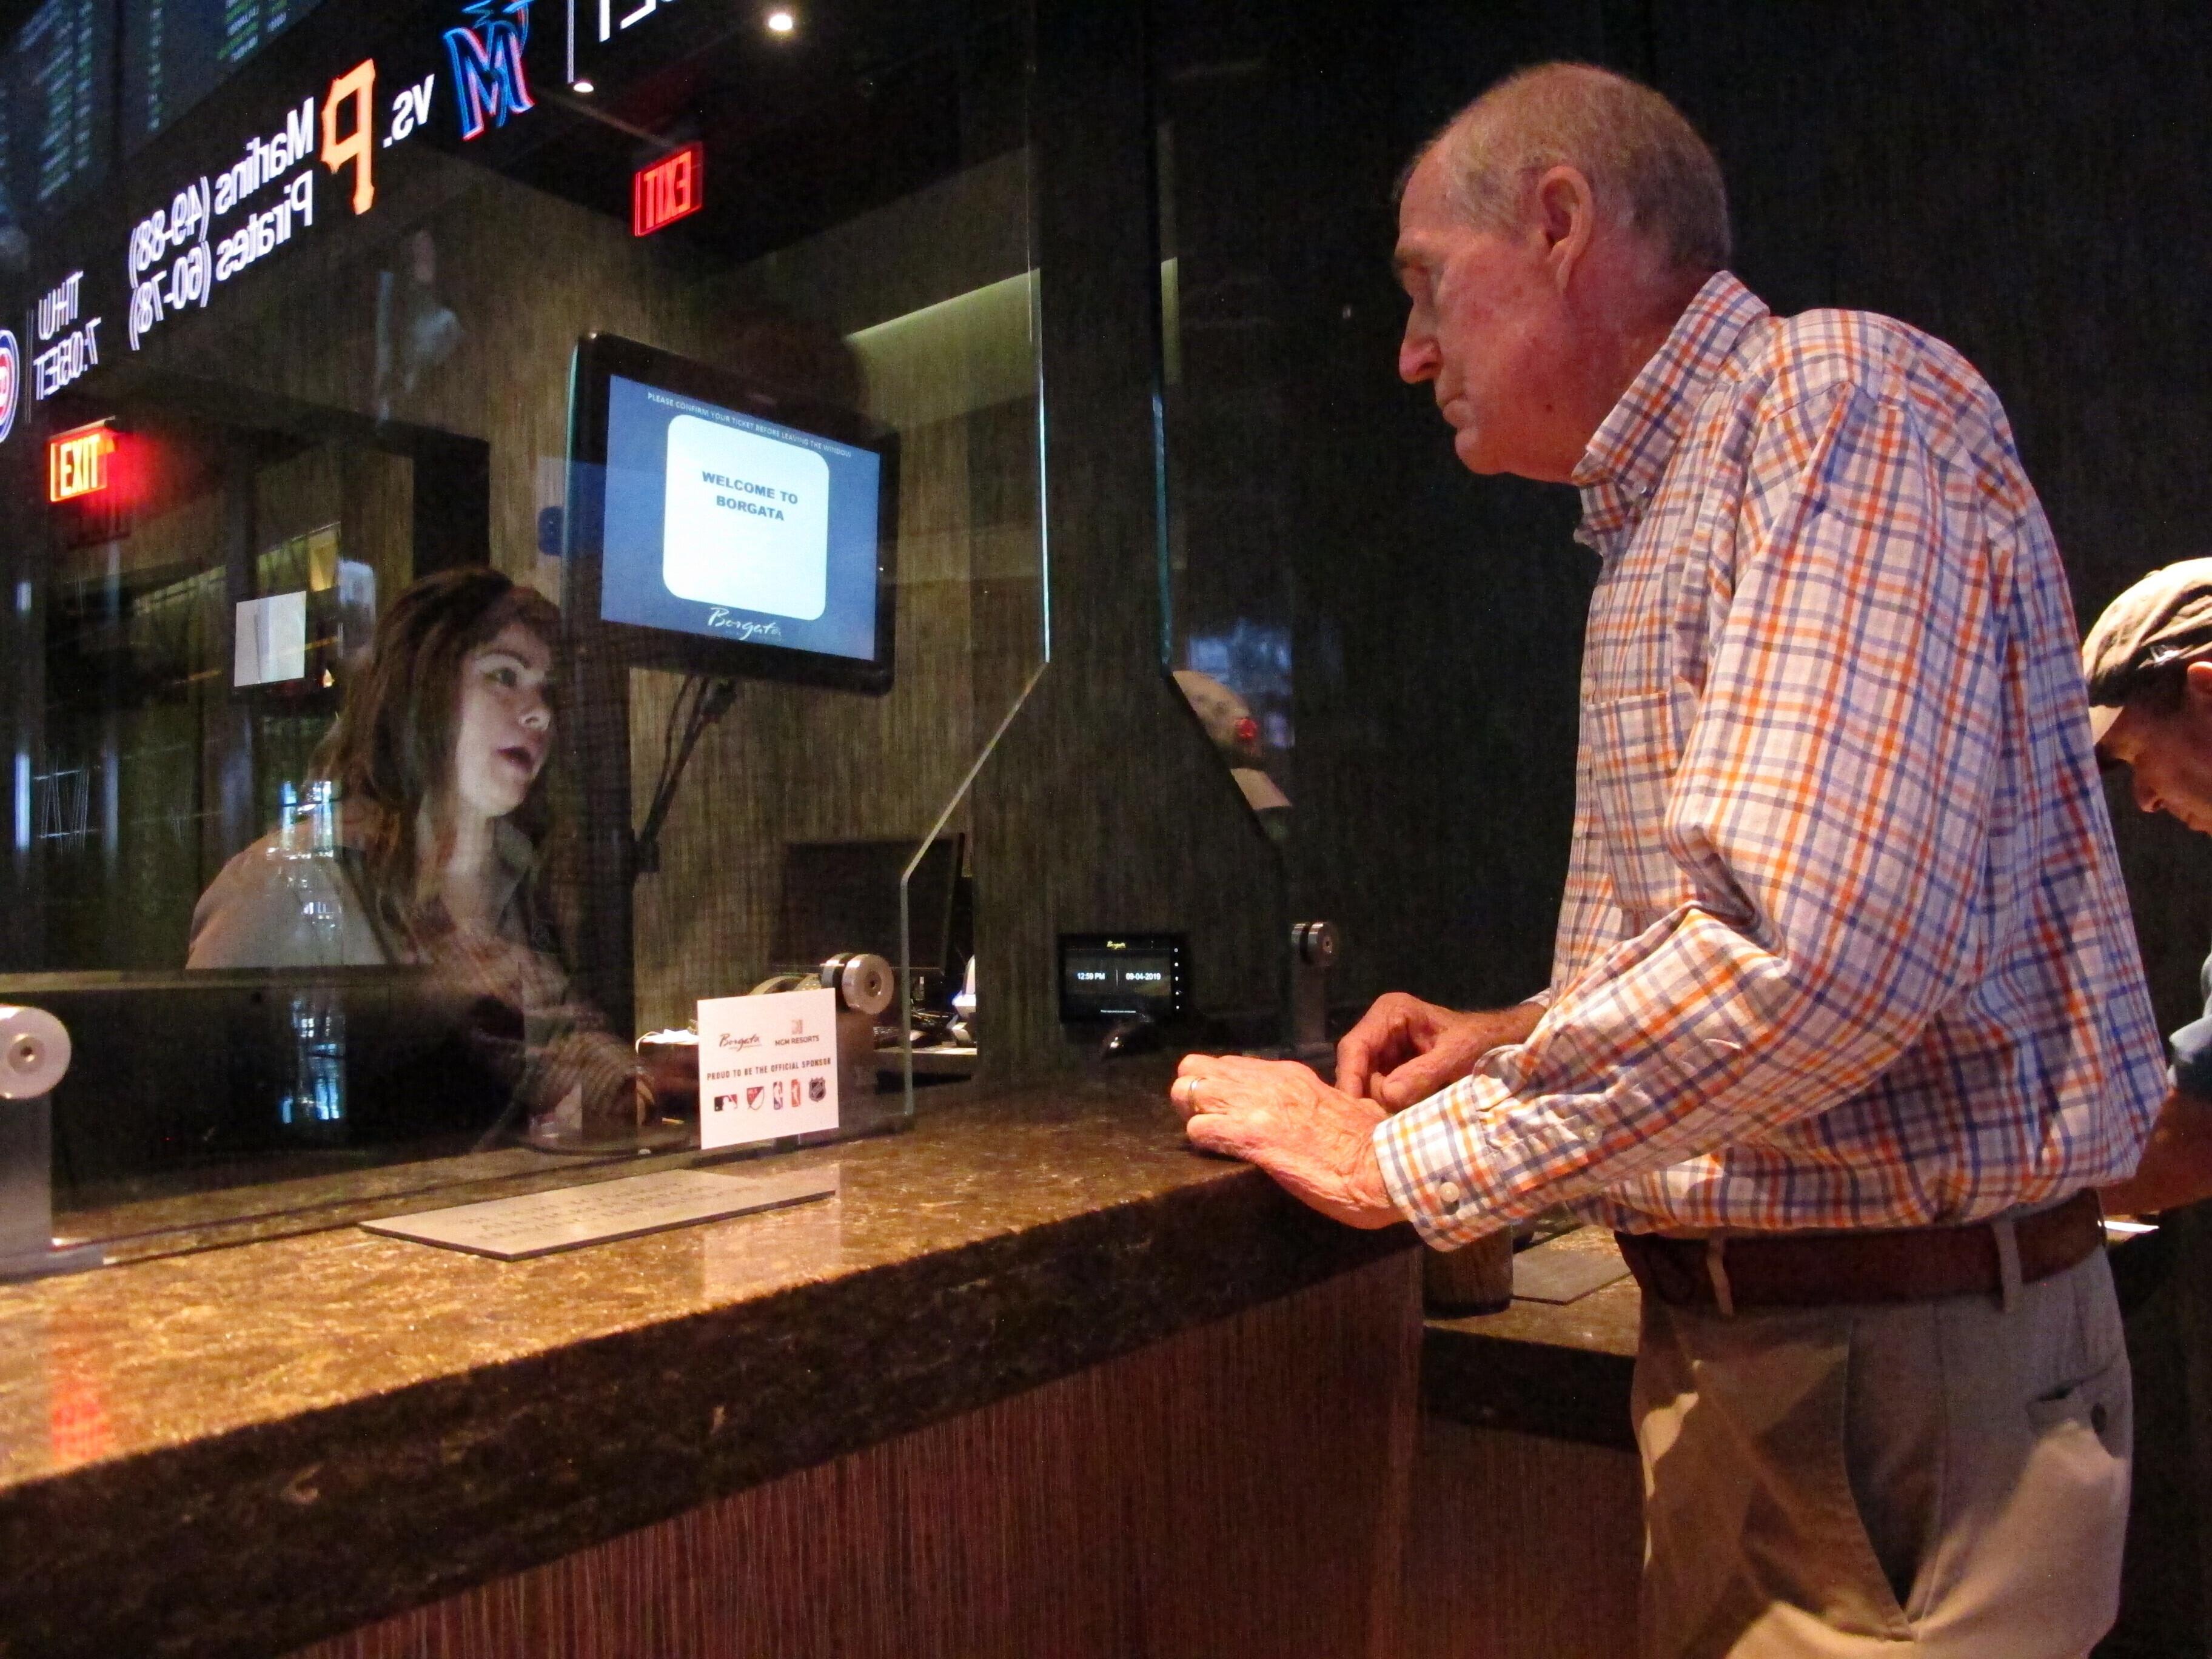 Casino revenue up 13% as Atlantic City rakes in $293M in sport bets